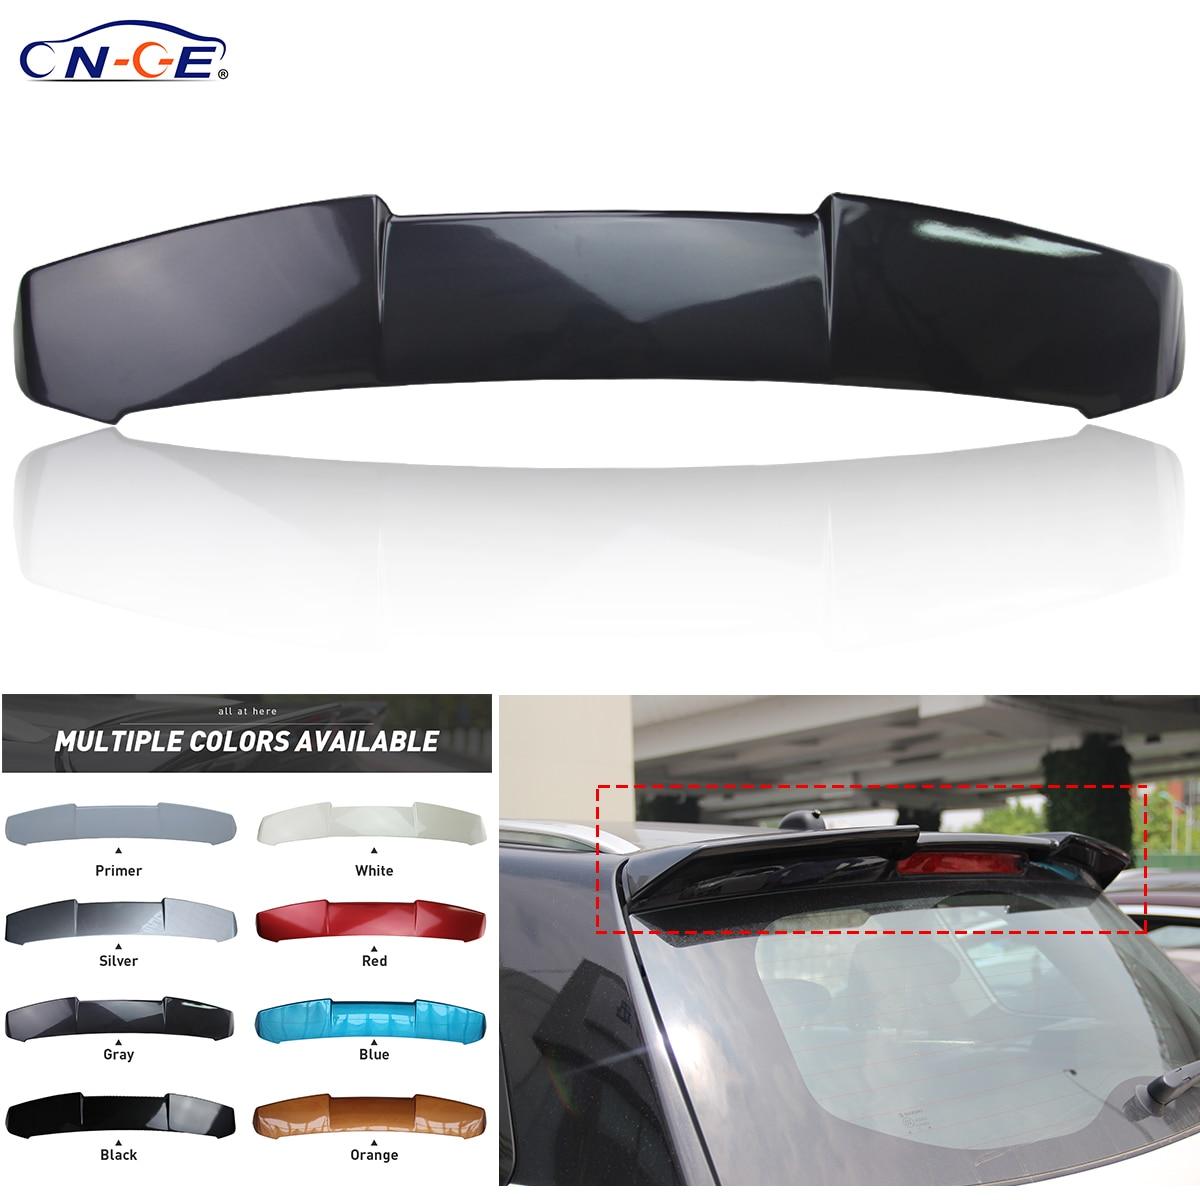 for suzuki vitara rear spoiler Tail Wing ABS gloss black Auto Rear Trunk Roof Refit Car exterior accessories 2020 2019 2018 2017